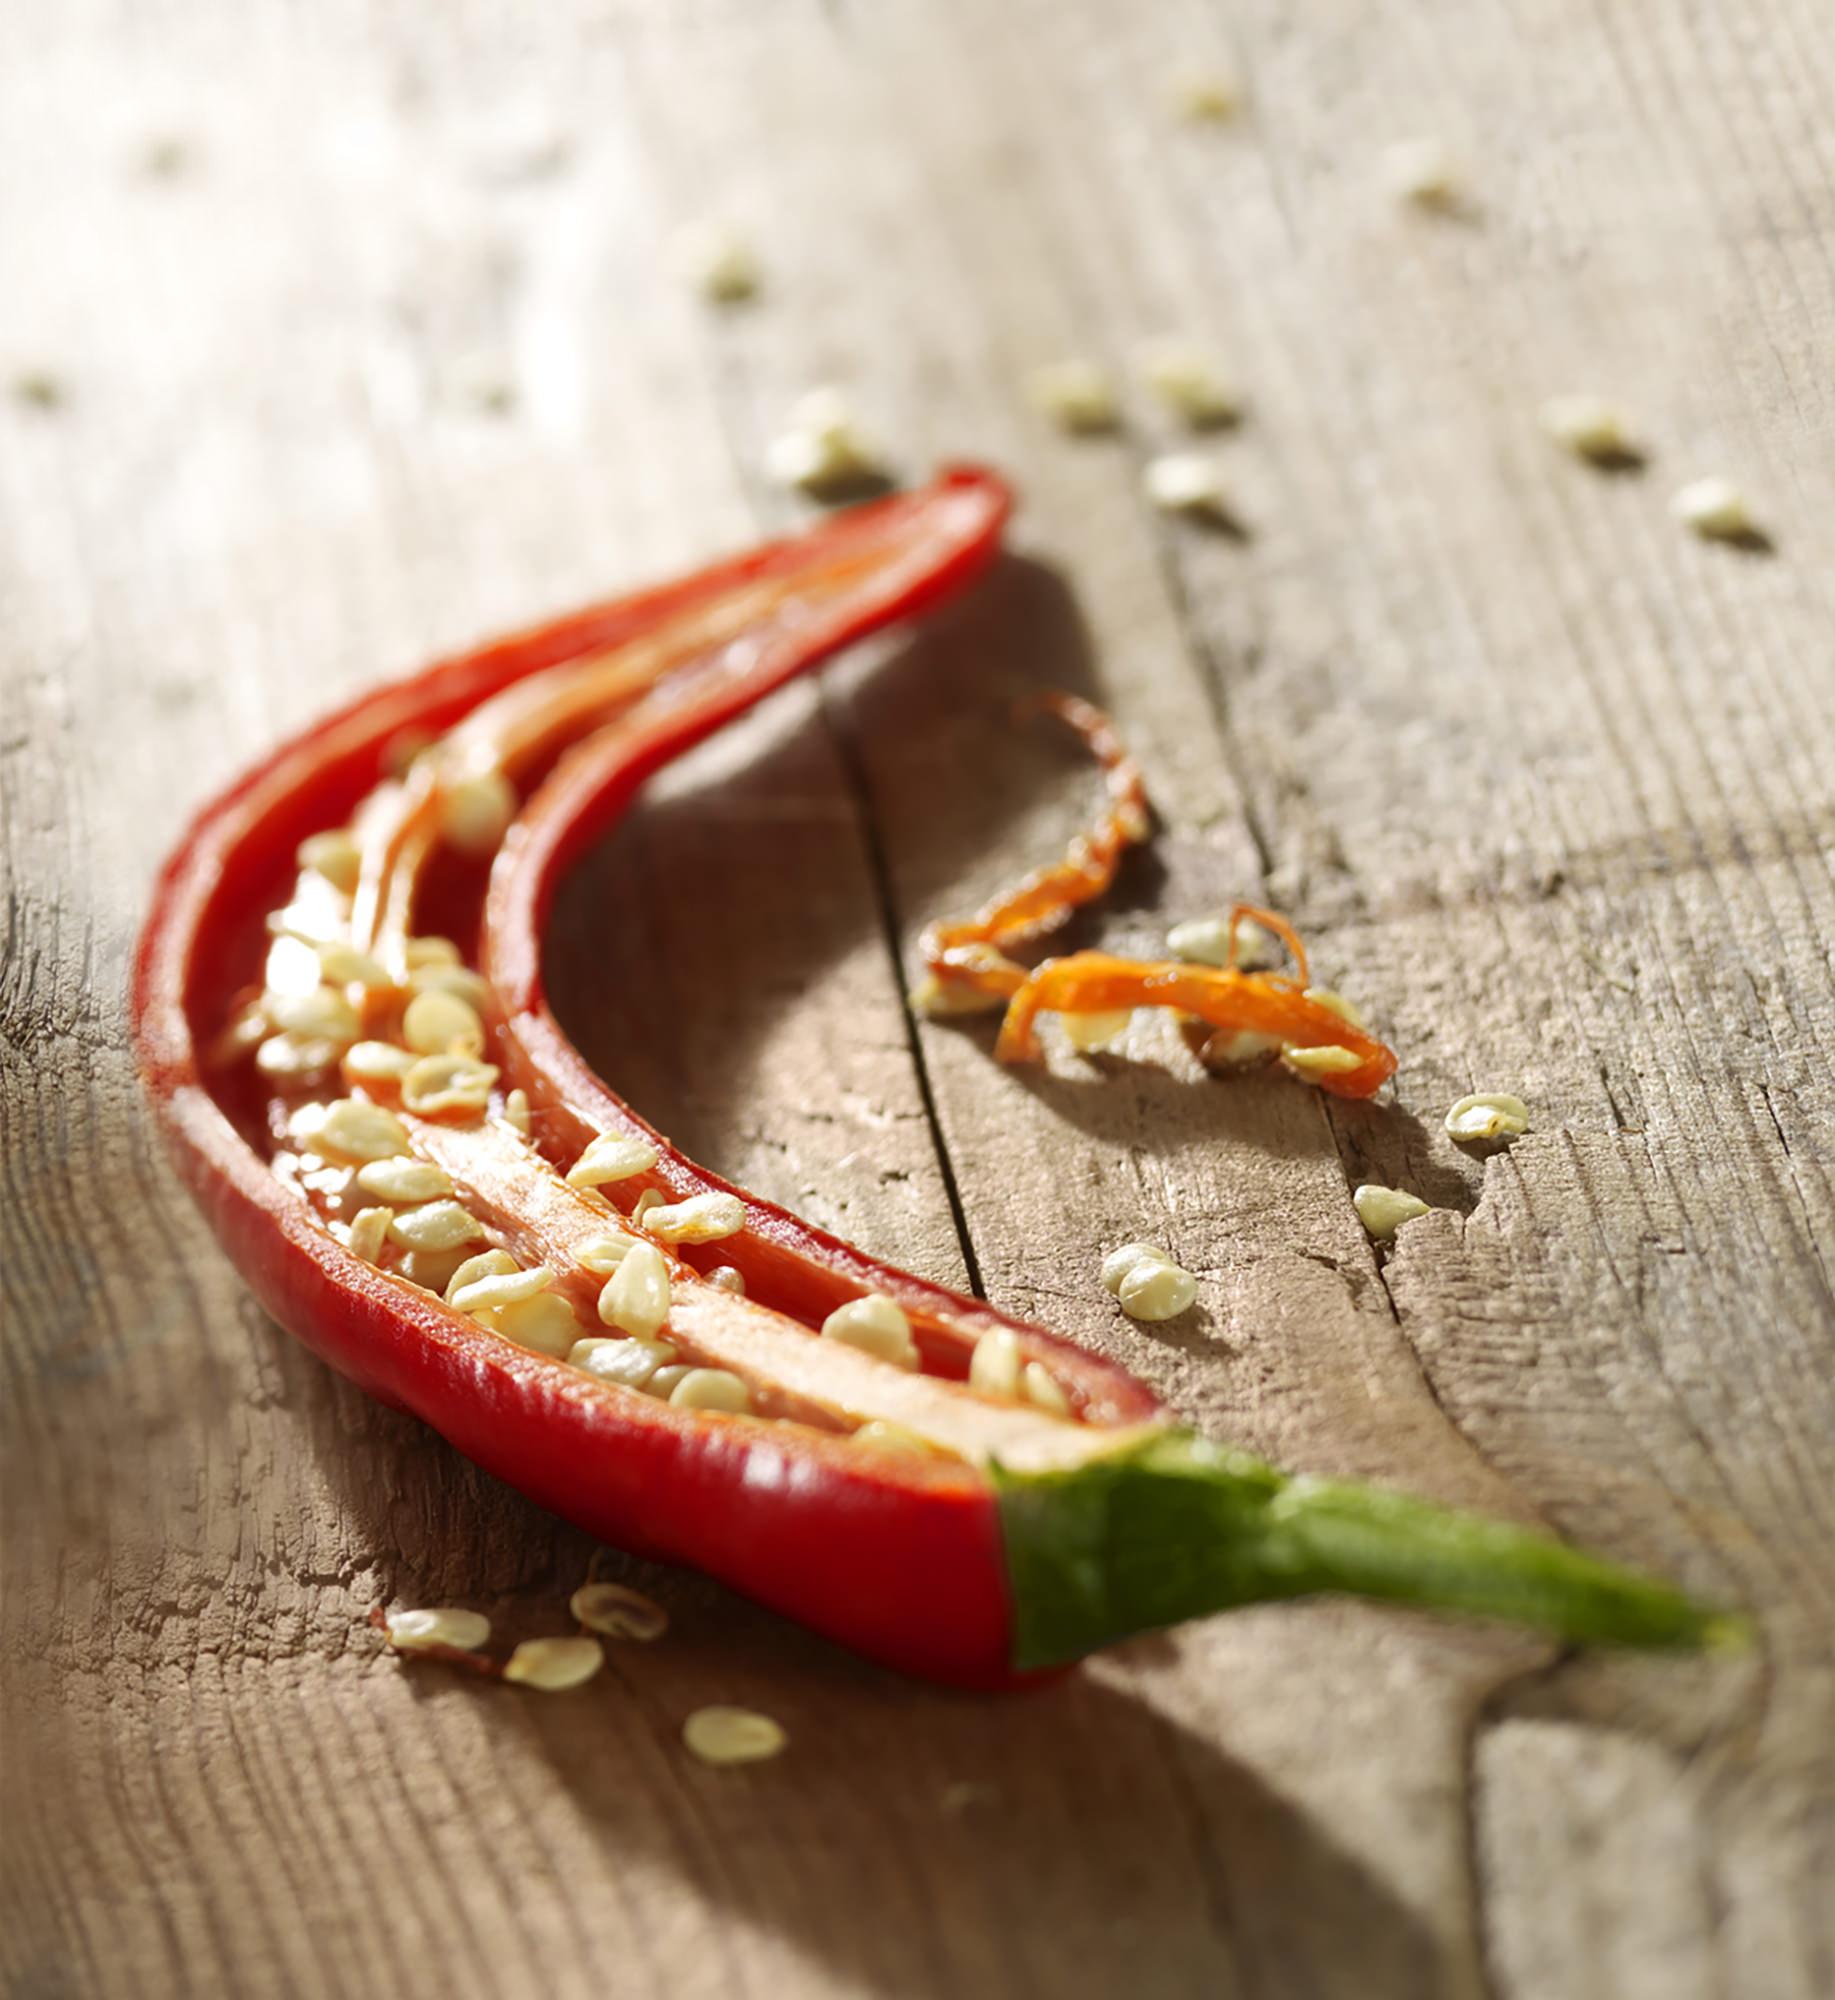 Packaging design photography studio food photographer CGI